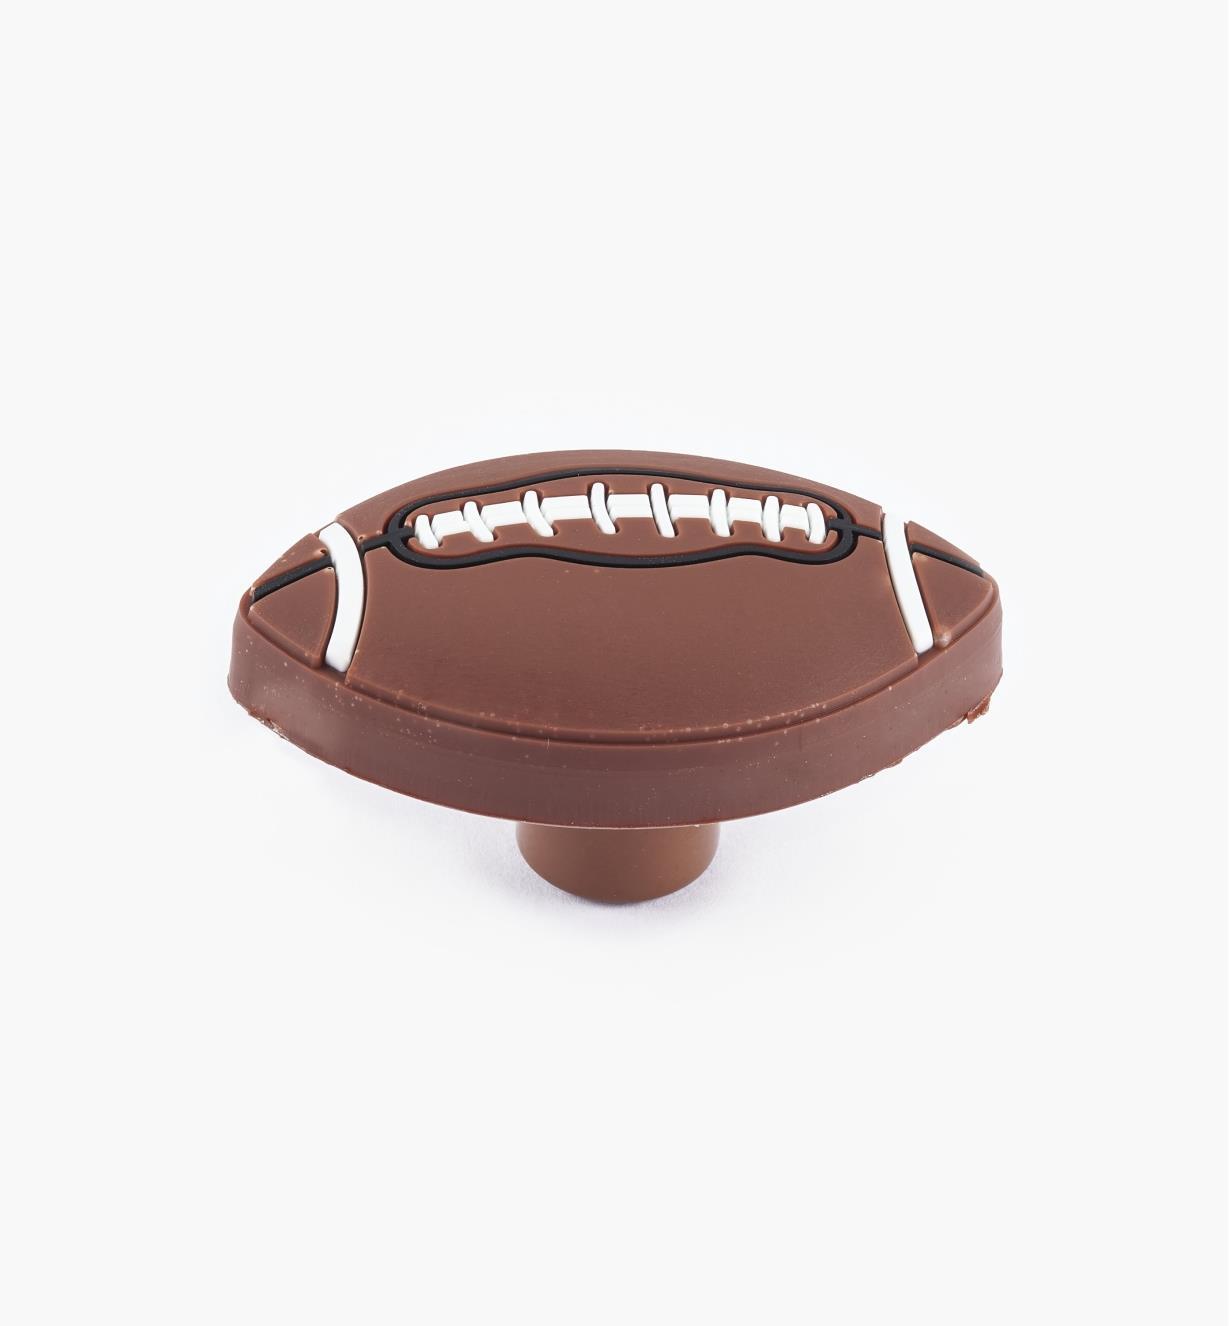 00W5611 - Football Knob